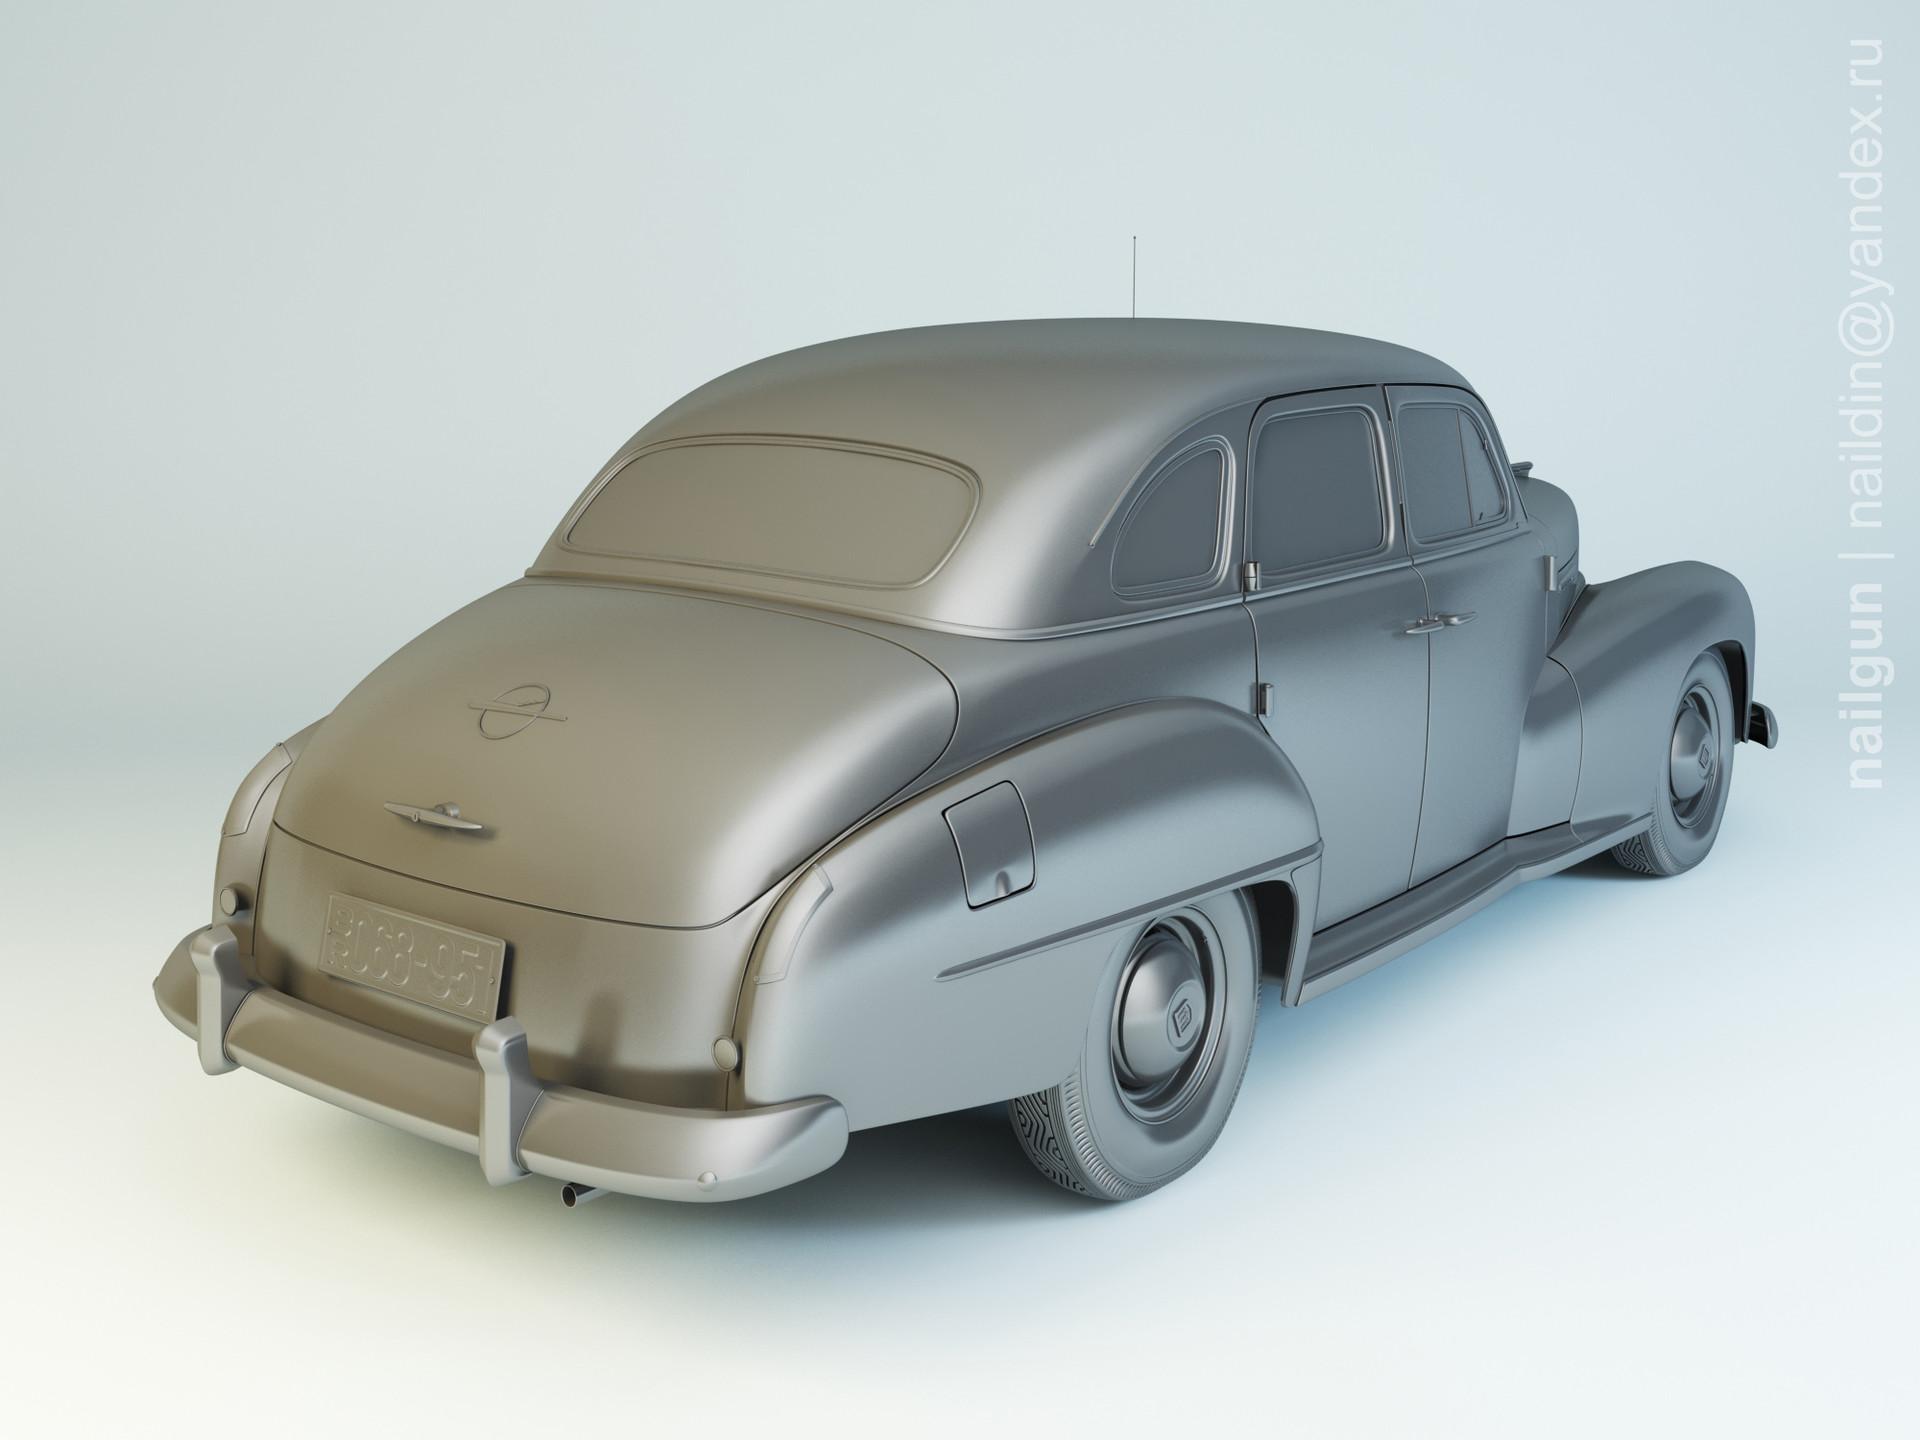 Nail khusnutdinov pwc 068 003 opel kapitan 1951 modelling 1